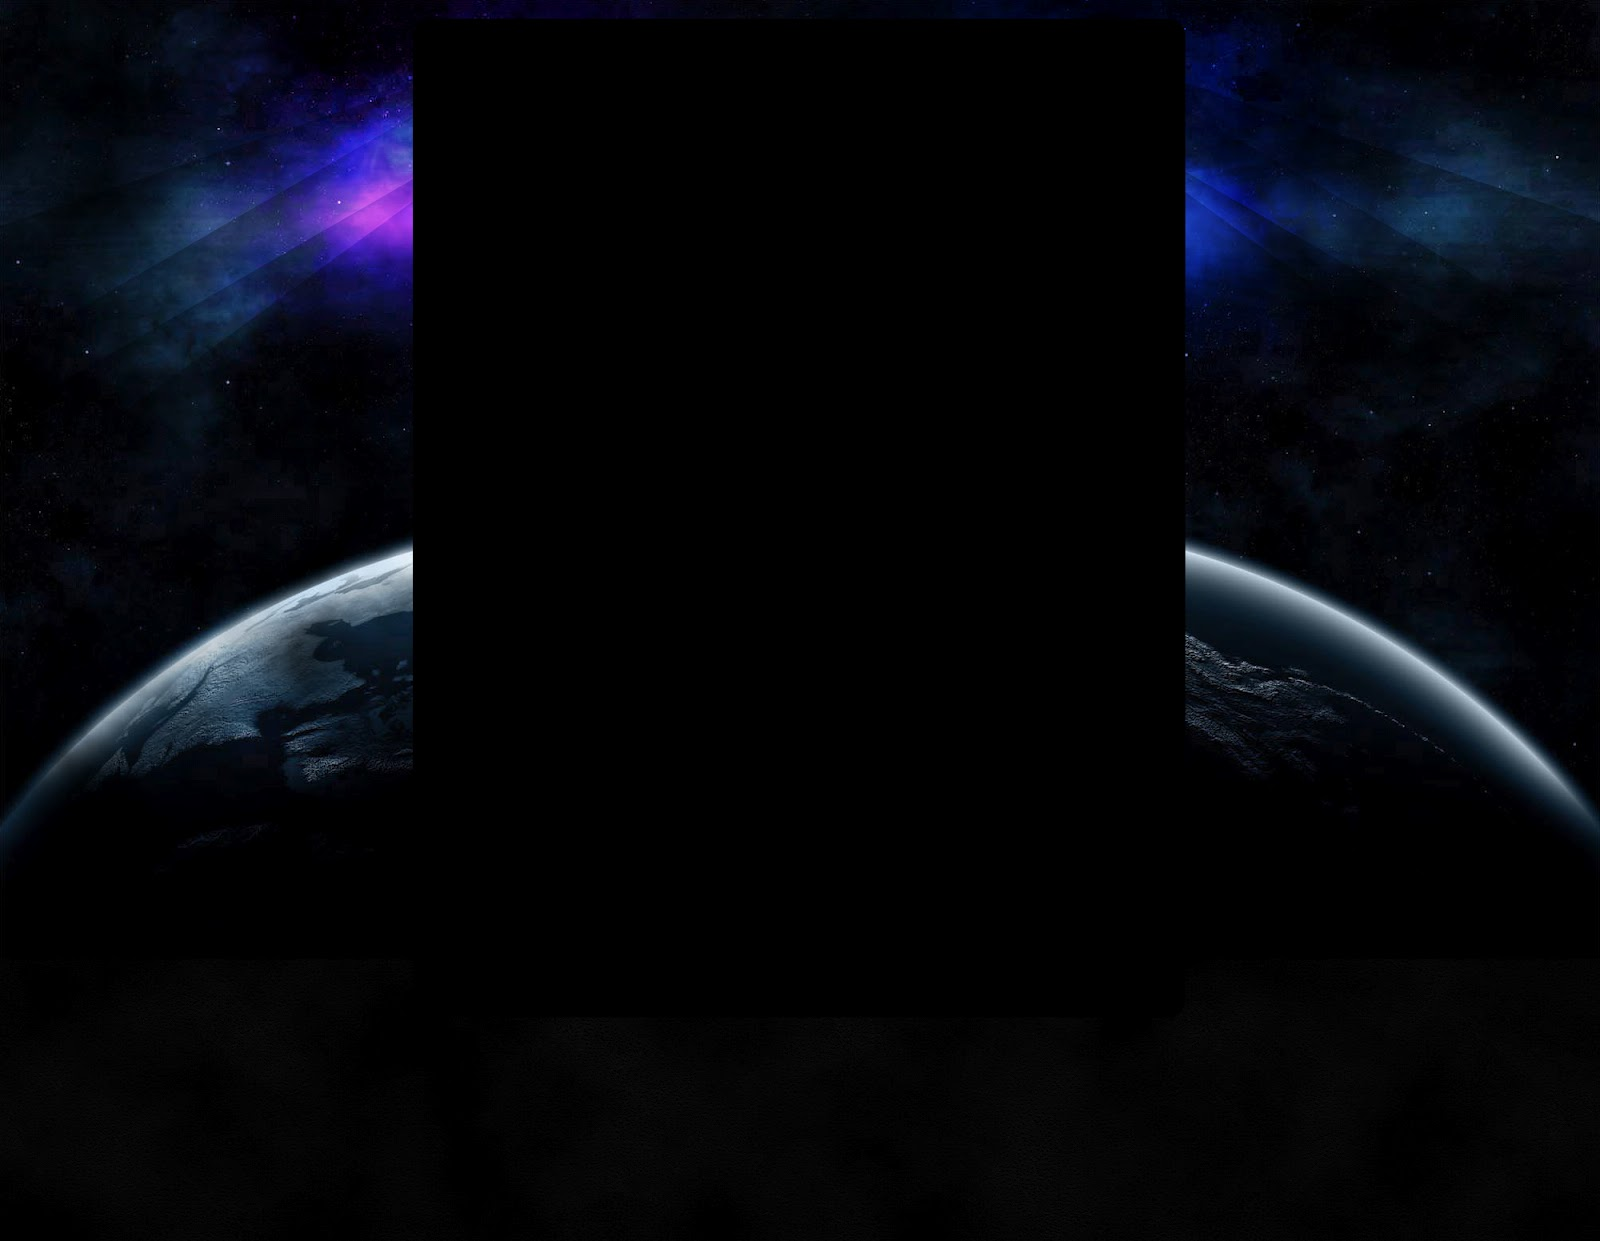 http://1.bp.blogspot.com/-j7knkNRmCKI/UFZ36x1usOI/AAAAAAAAByo/voOK7h7U1aw/s1600/Cosmos+Youtube+Background+2.jpg